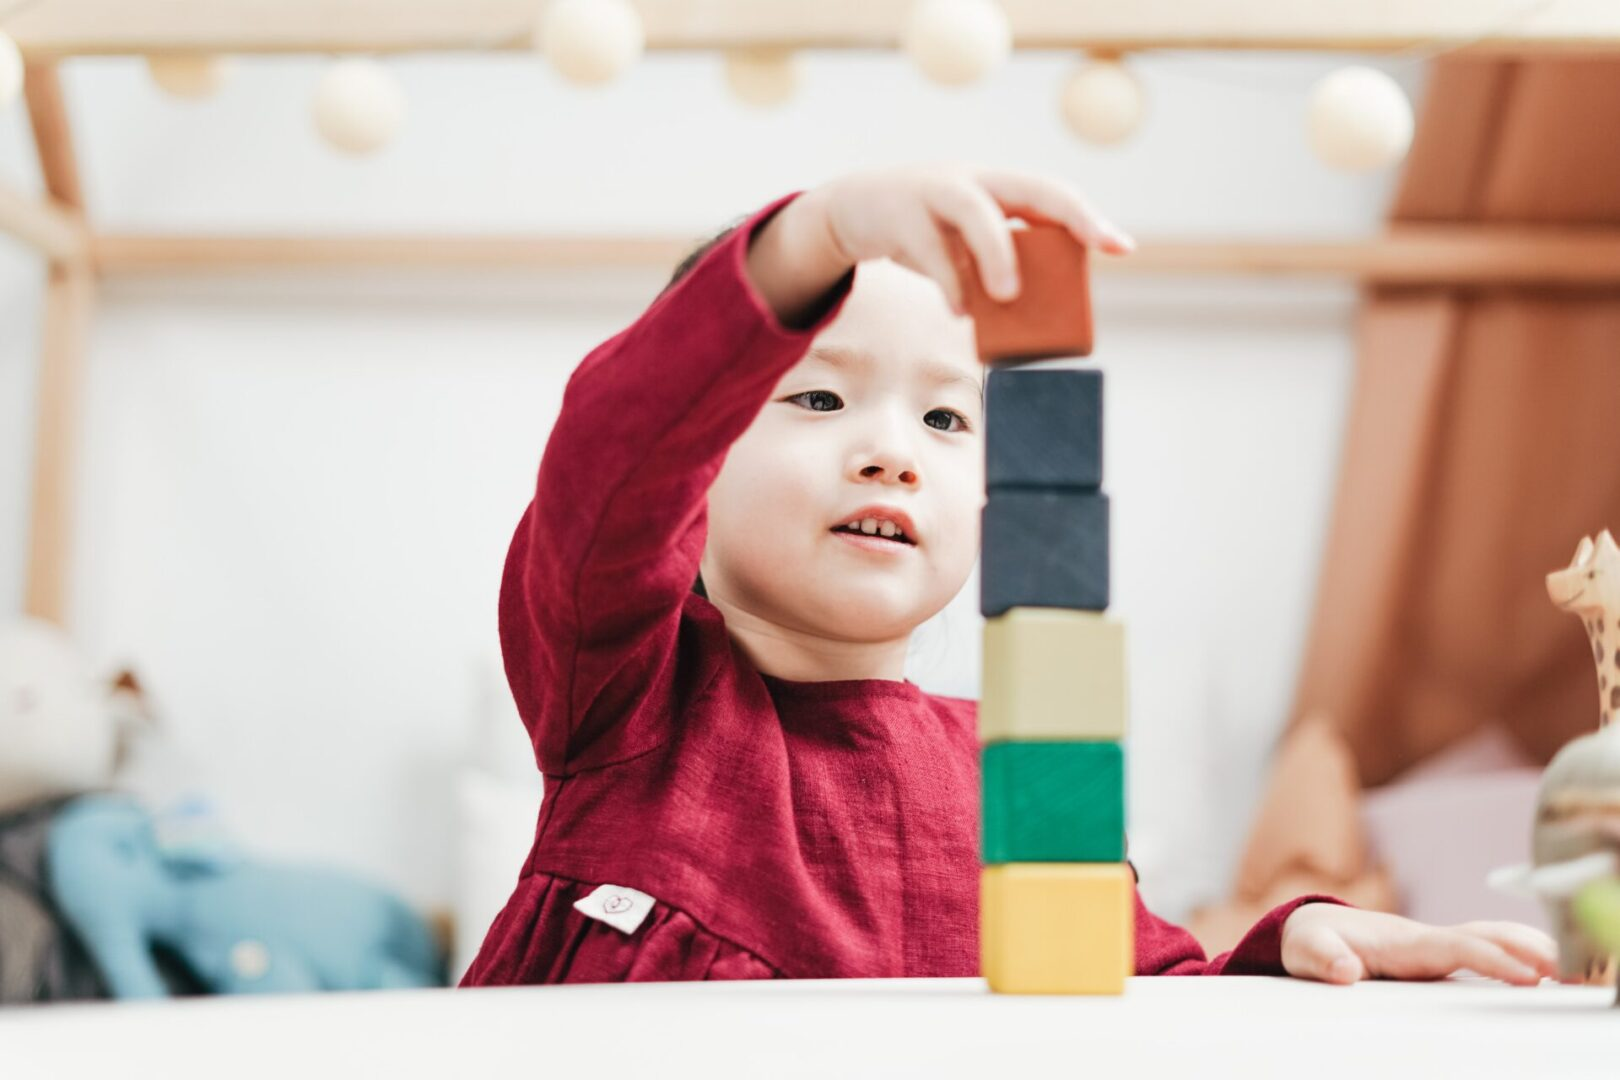 child-playing-wooden-blocks-3662635